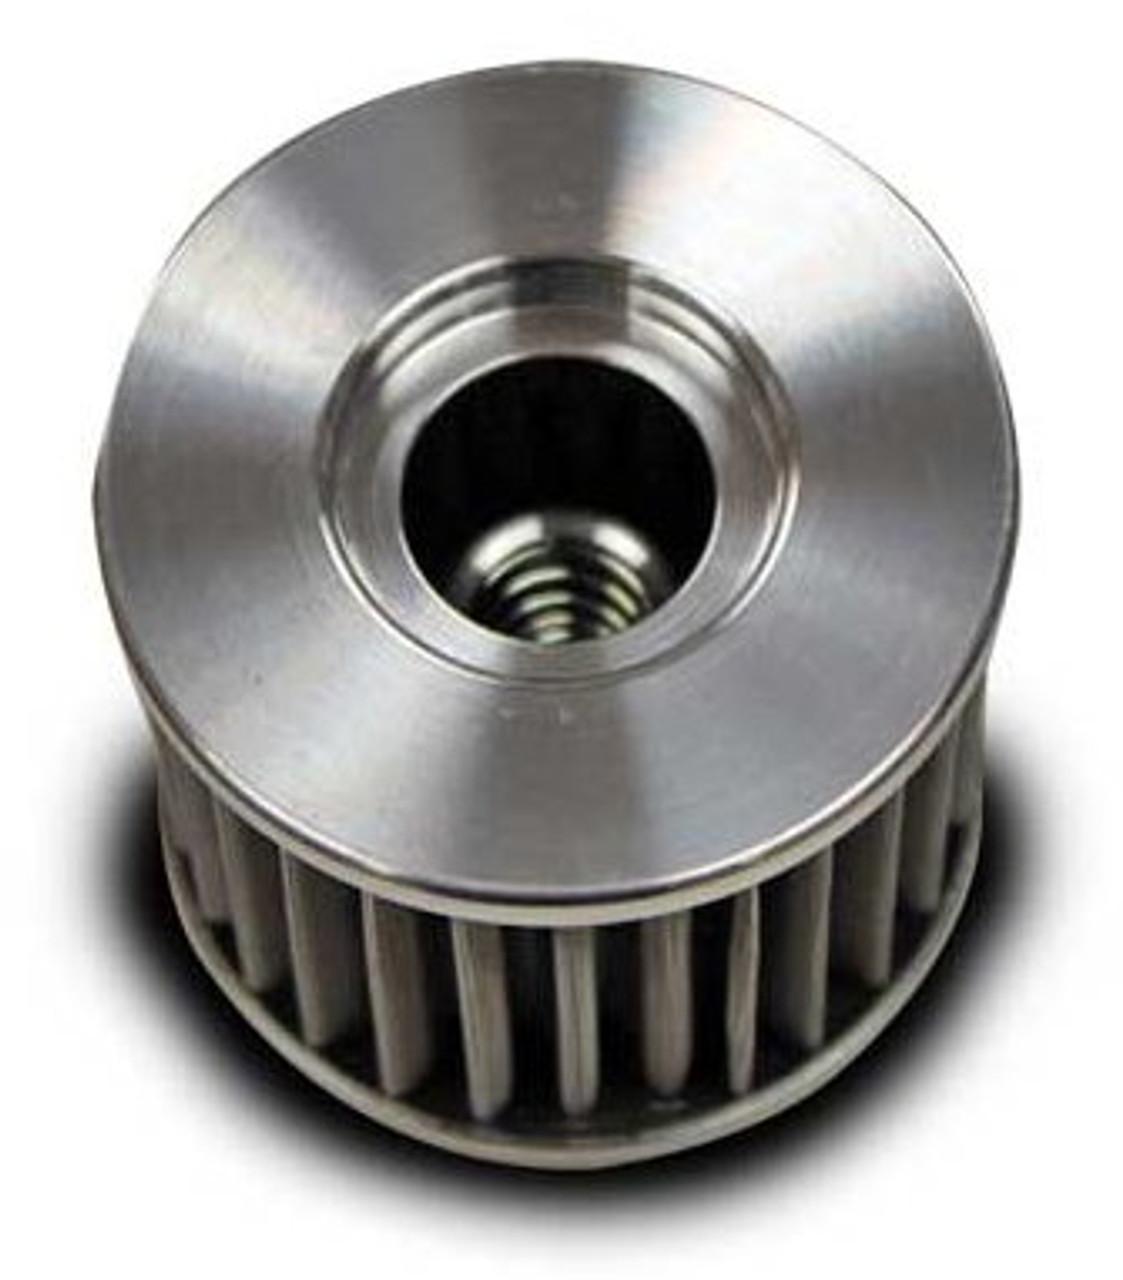 Schnitz Stainless Steel Lifetime Reusable Oil Filter Suzuki GS1100-GS1150